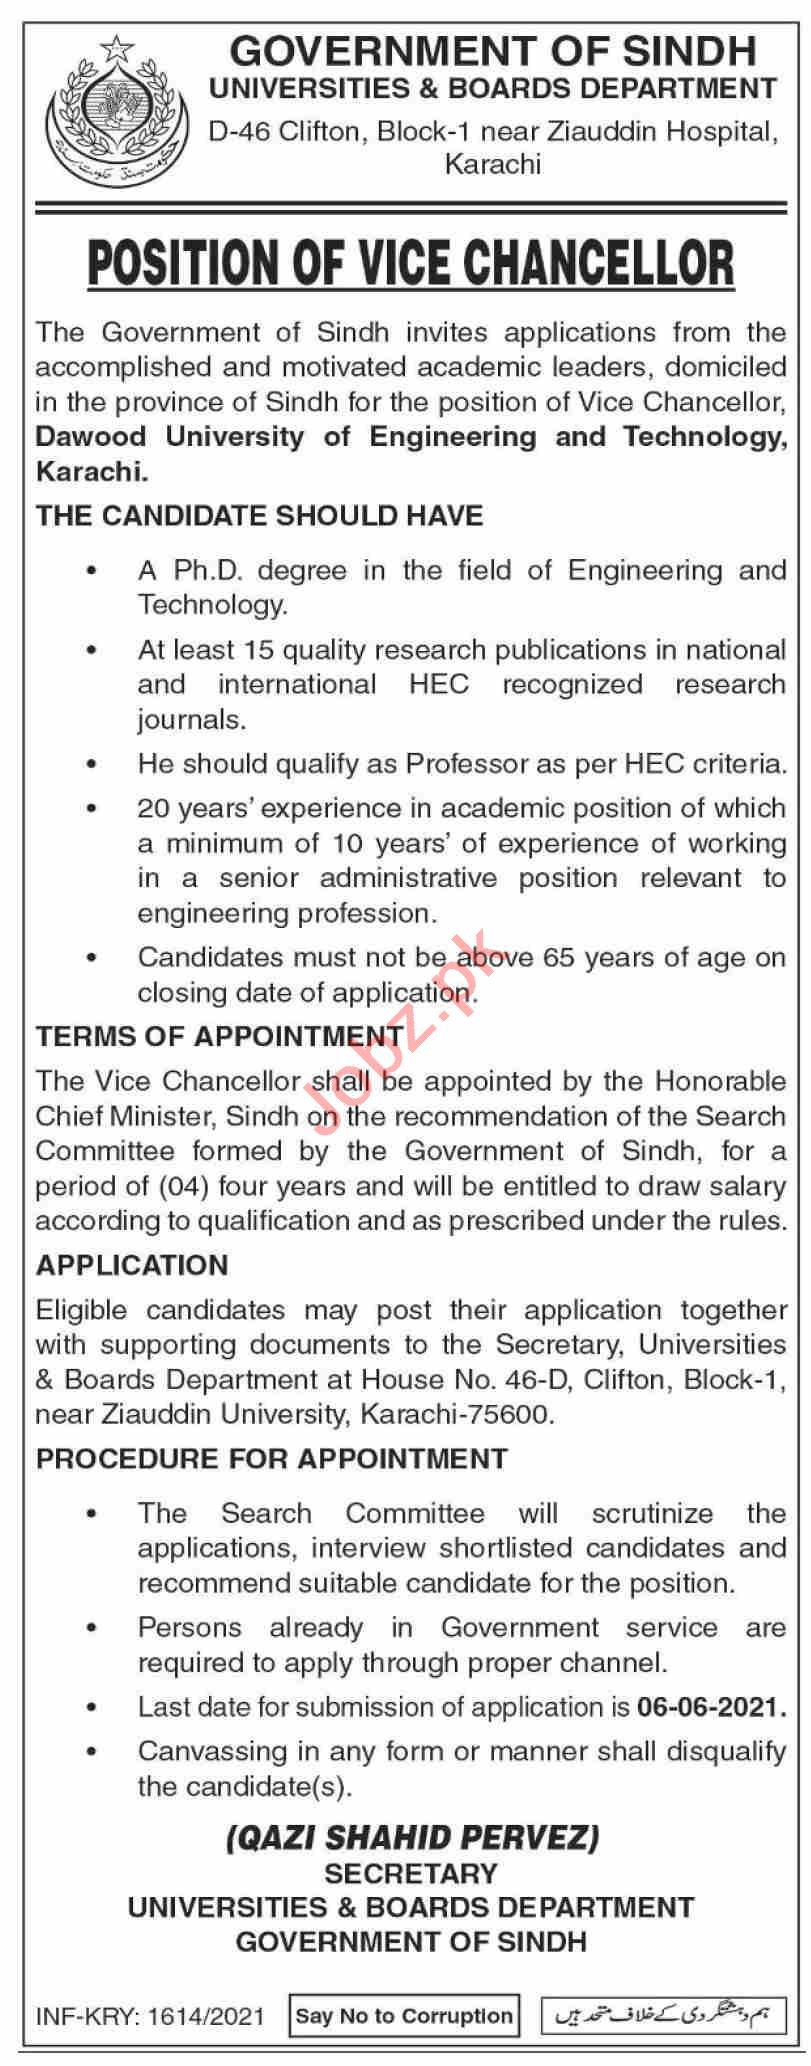 Dawood University of Engineering & Technology DUET Jobs 2021